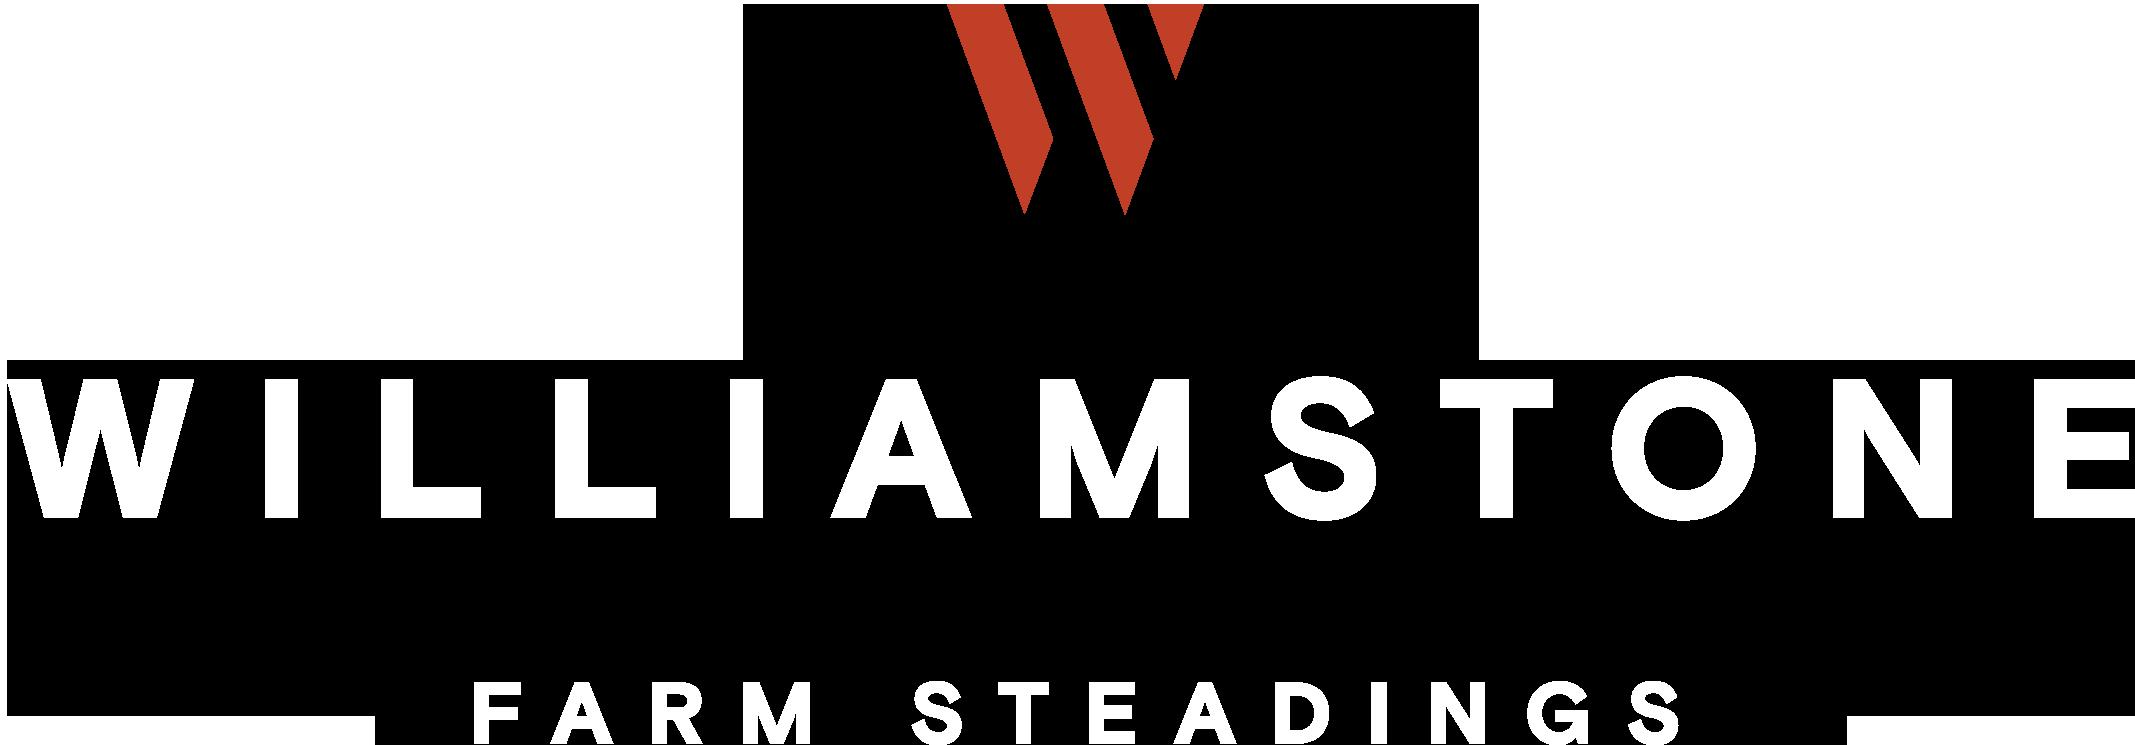 Williamstone Farm Steadings